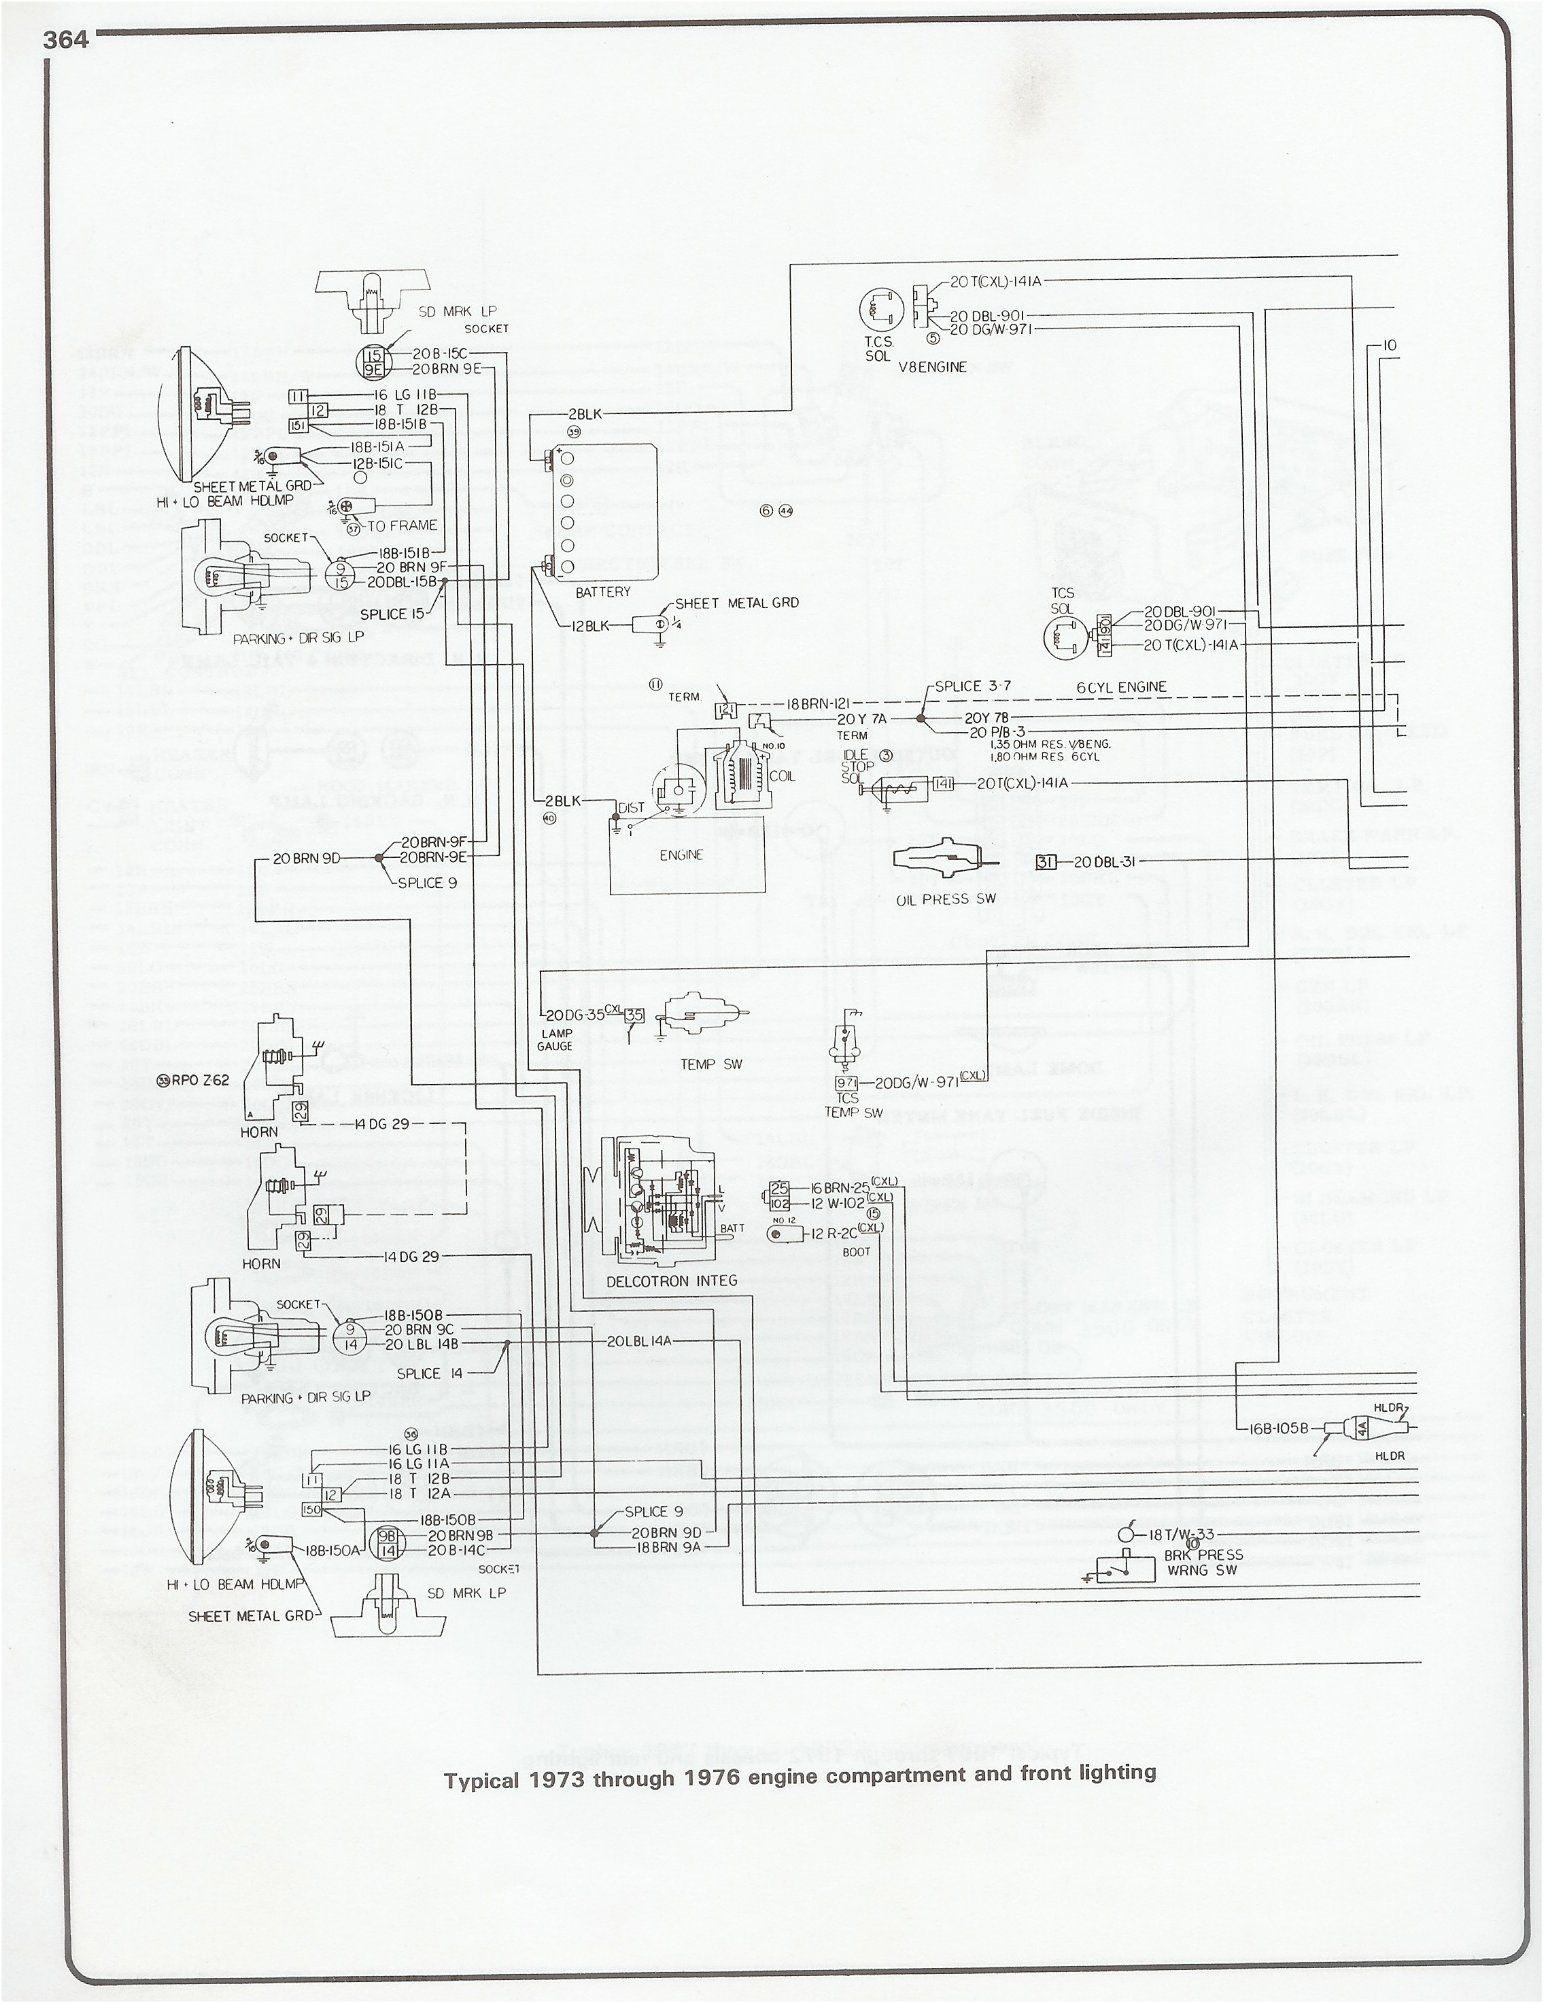 Wiring Diagram 1973 1976 Chevy Pickup Chevy Wiring Diagram 1976 Chevy Truck 1973 Chevy Truck Chevy Pickups